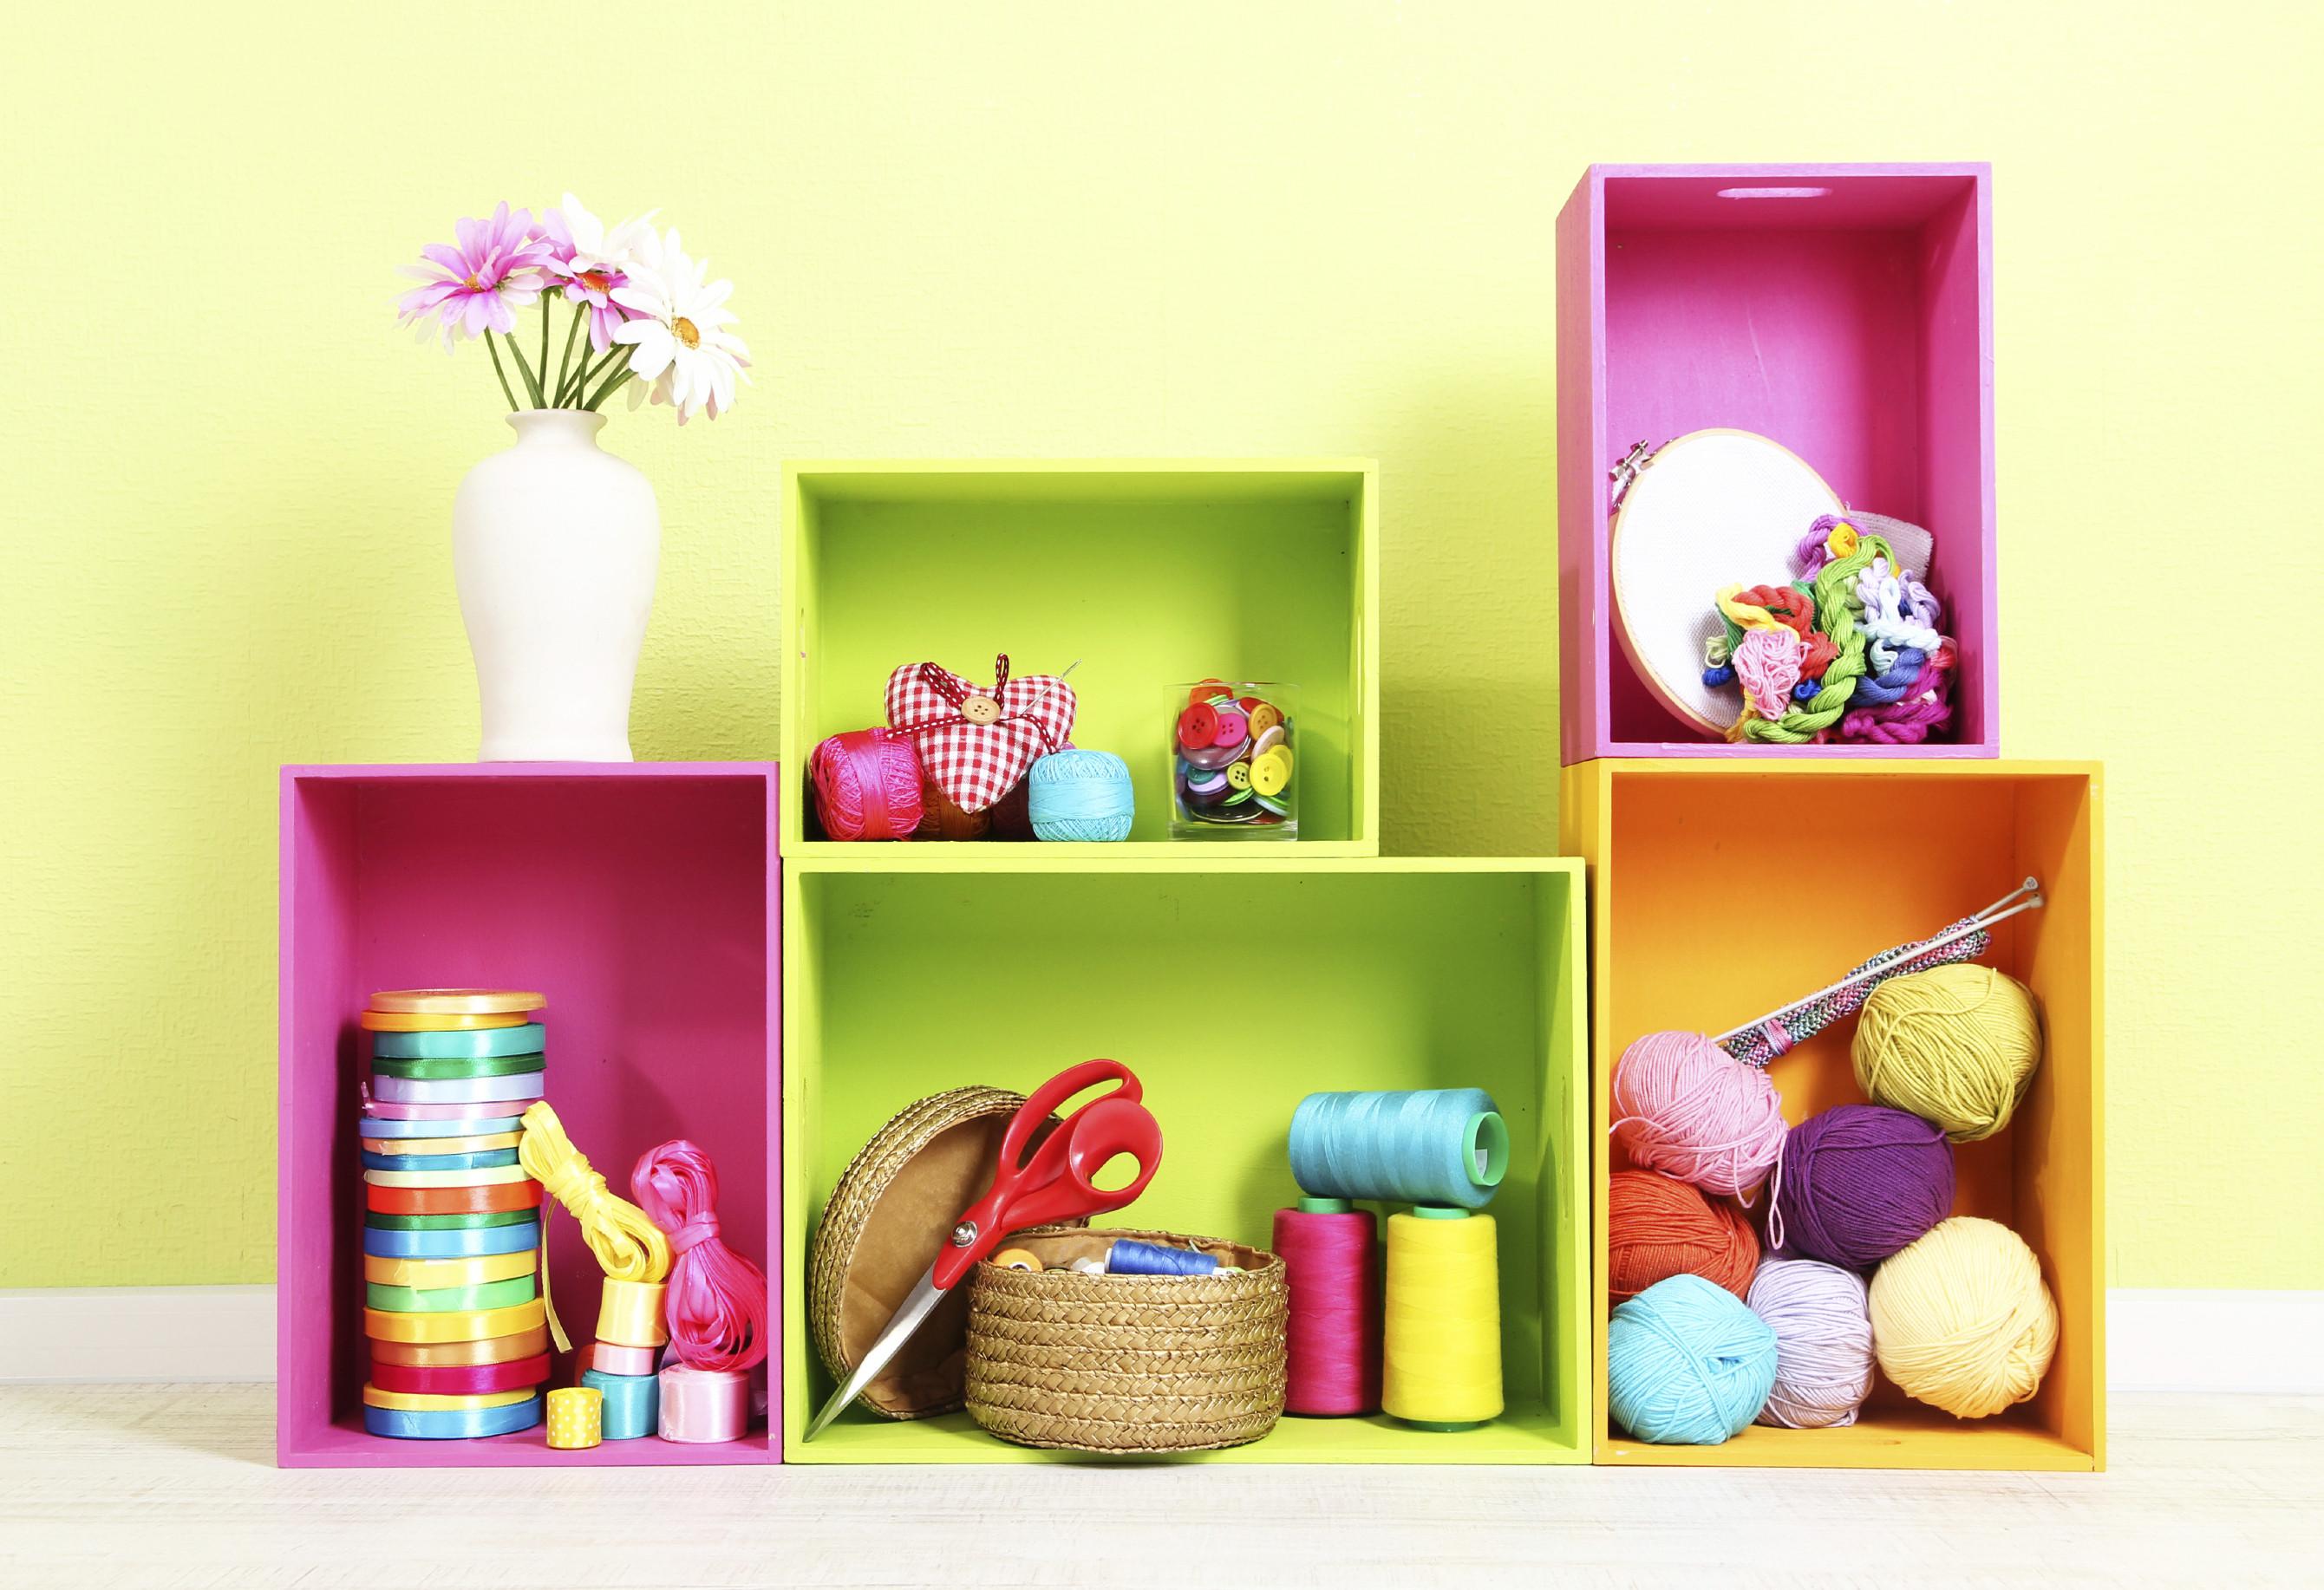 Diy Blog  Top 10 Best Blogs for DIY Apartment Decor Ideas My First